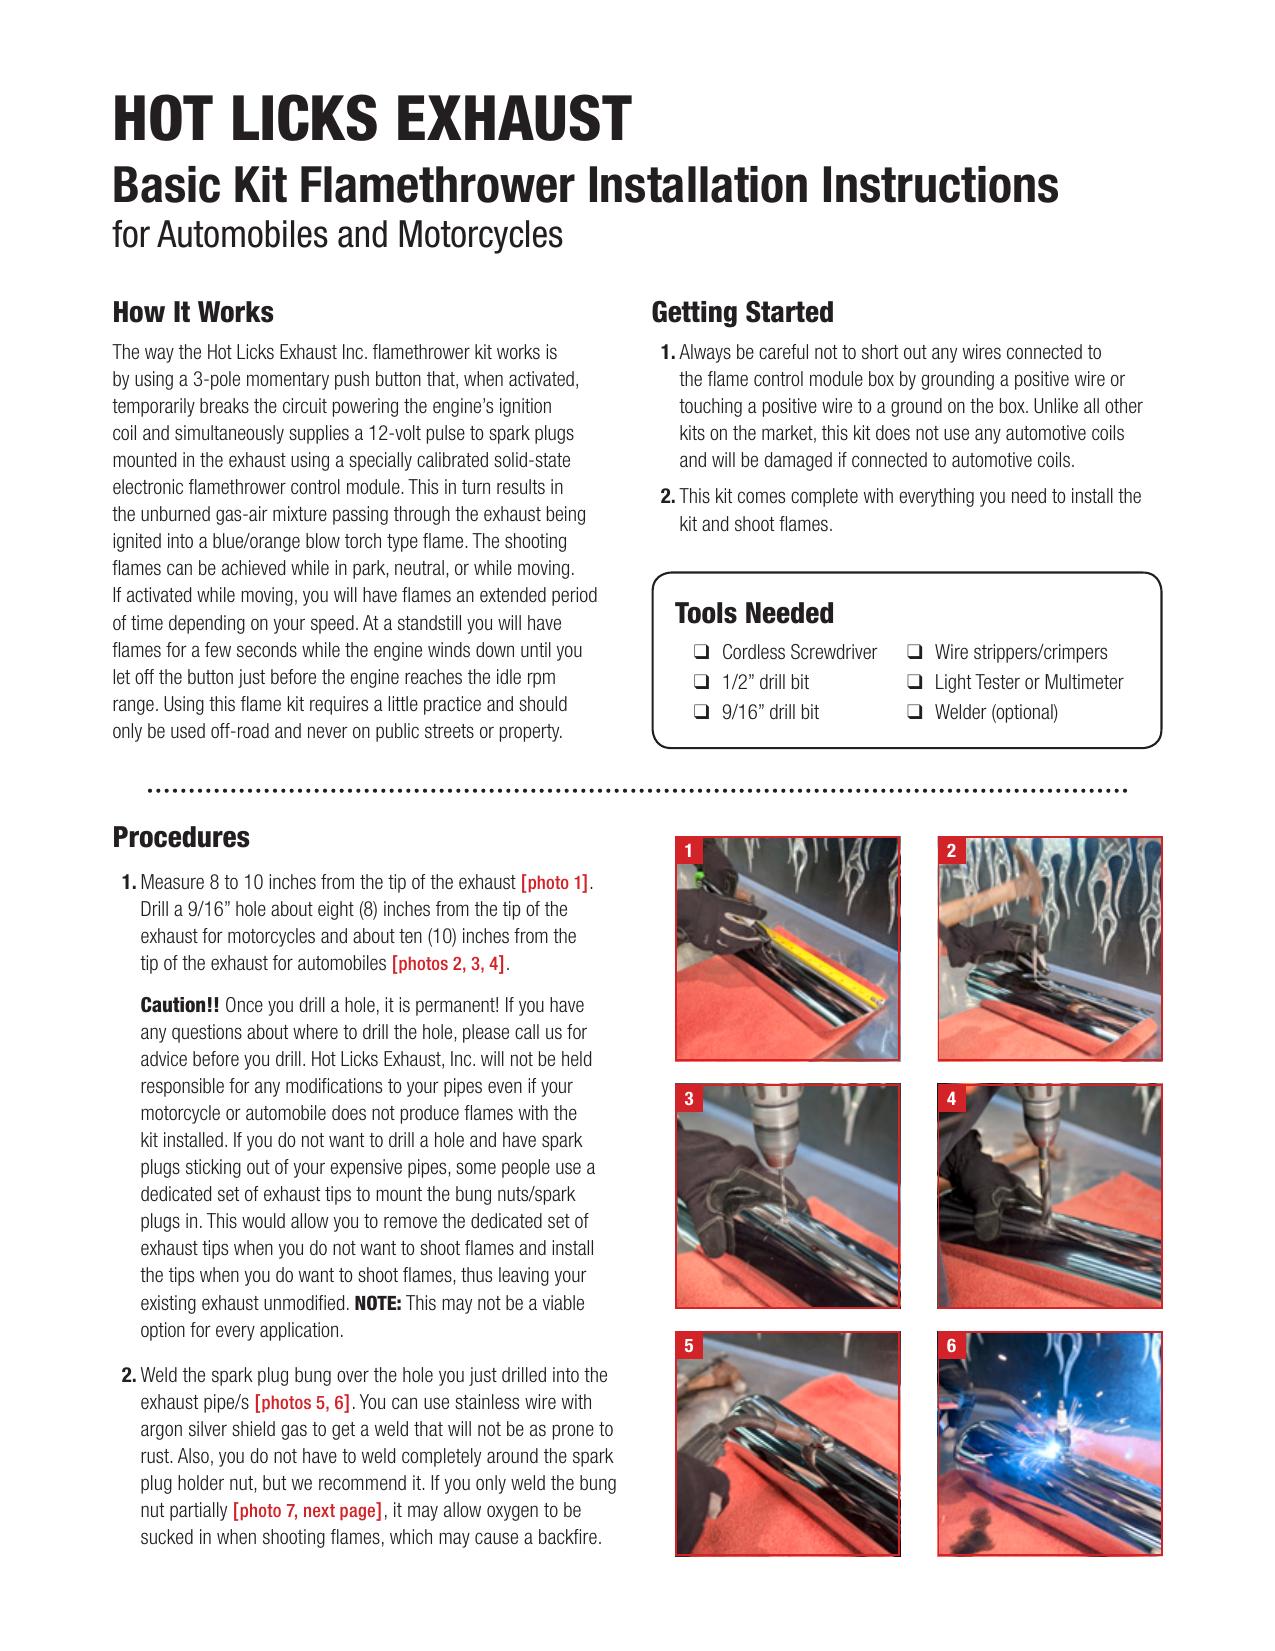 Basic Kit Flamethrower Installation Instructions | manualzz com